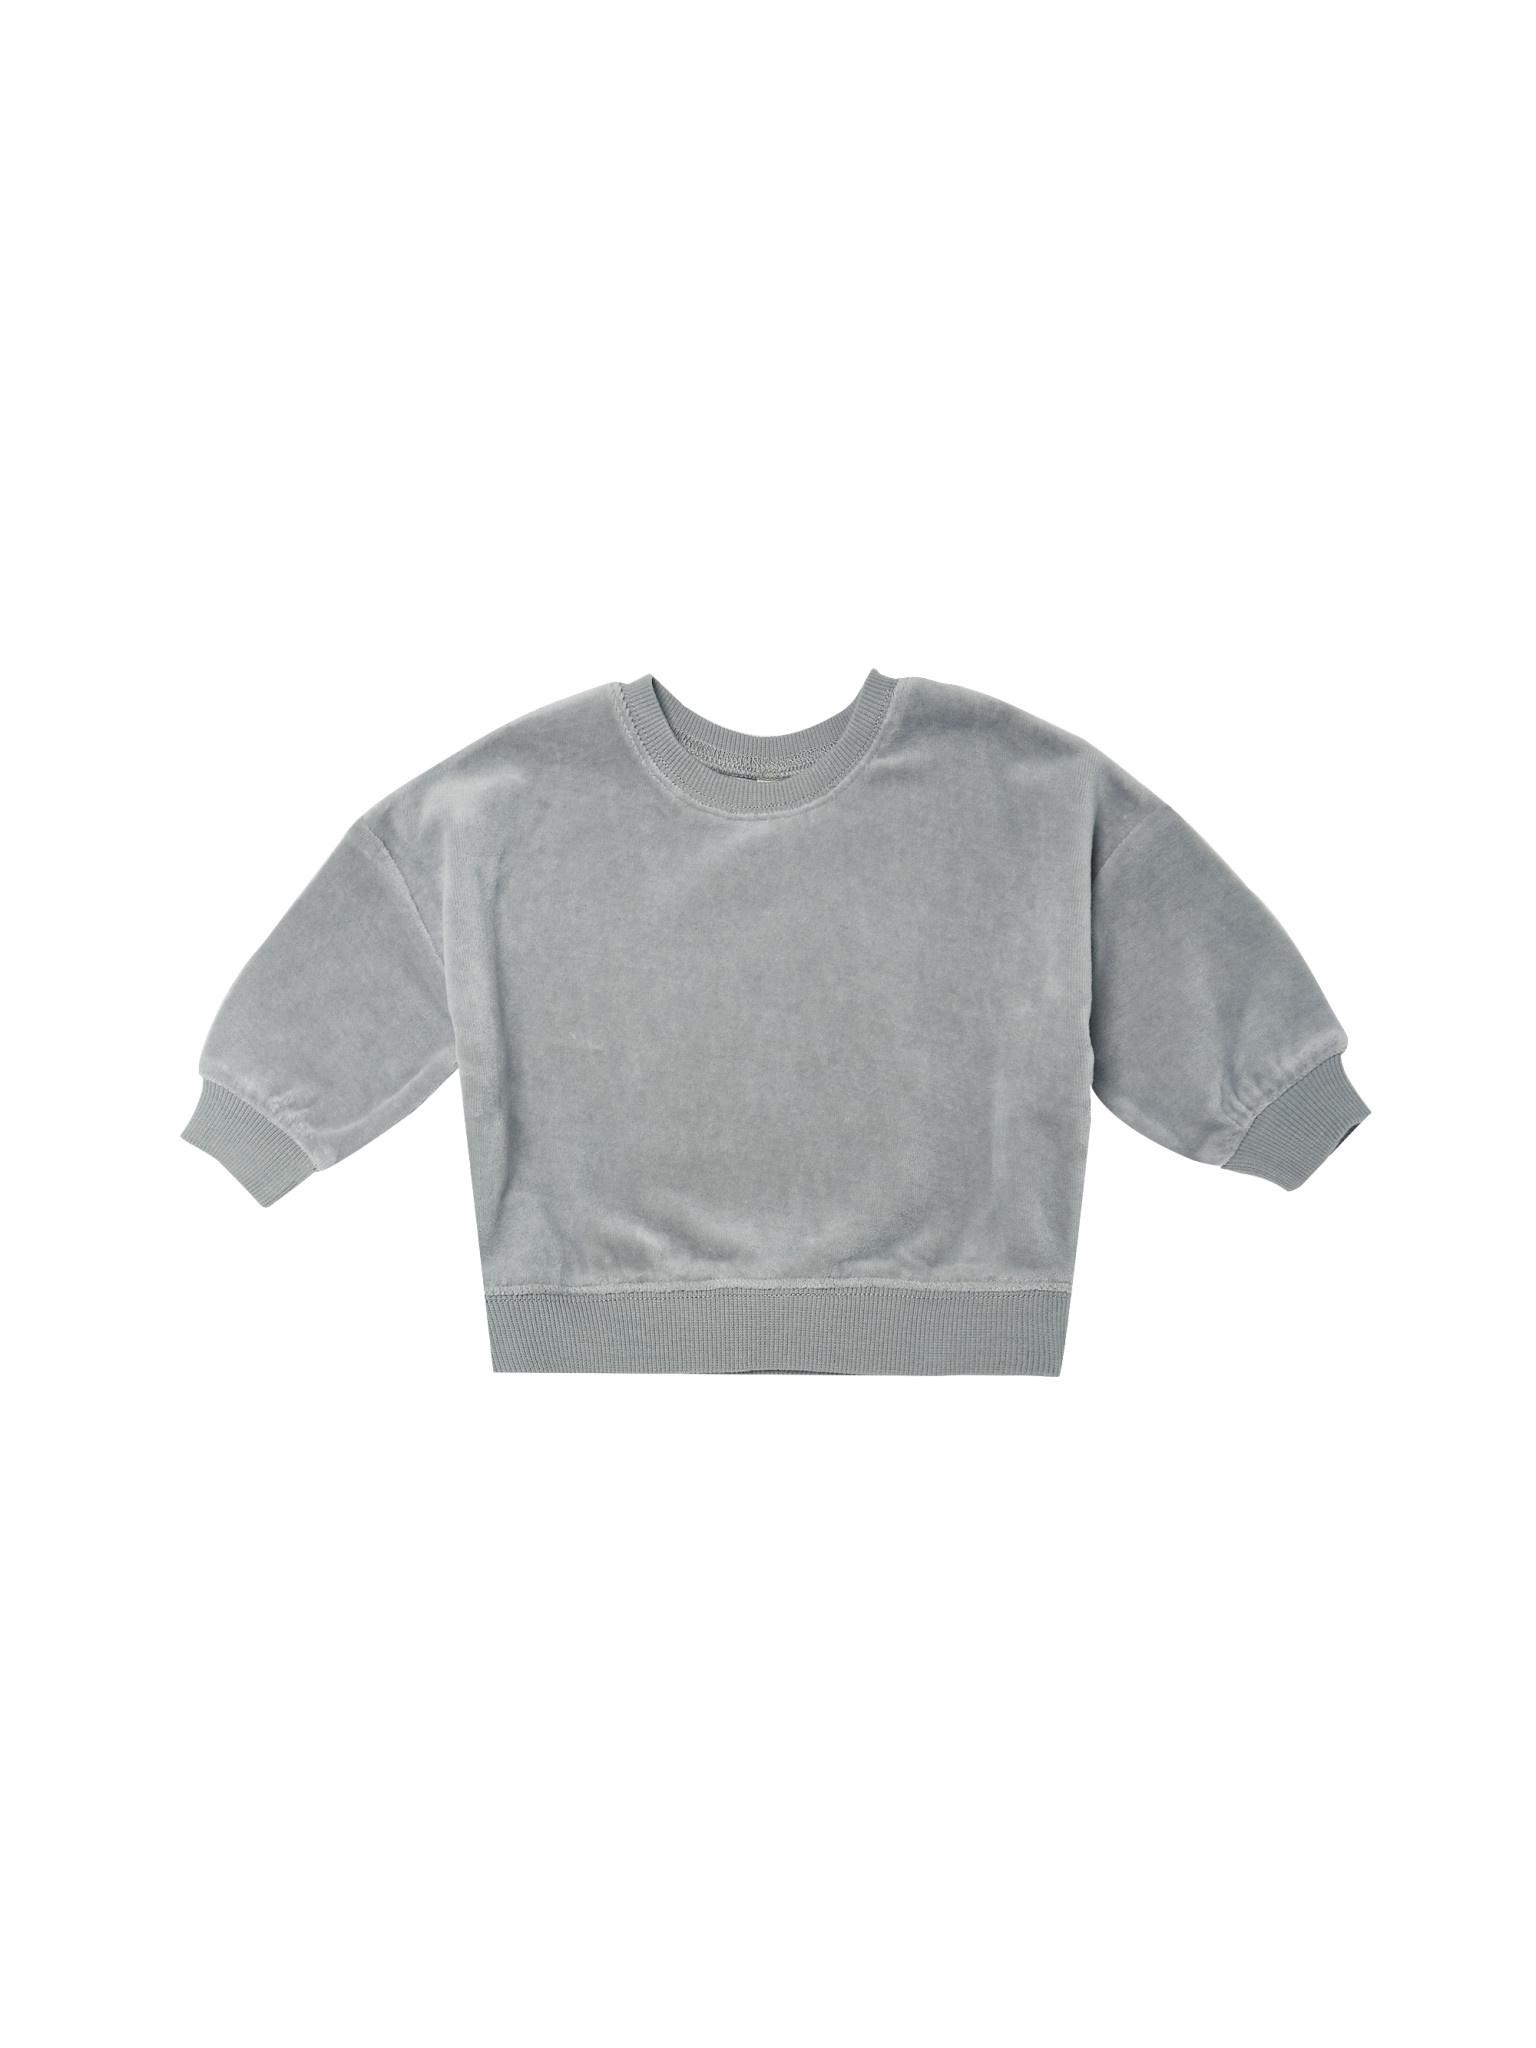 QUINCY MAE Drop Shoulder Sweatshirt